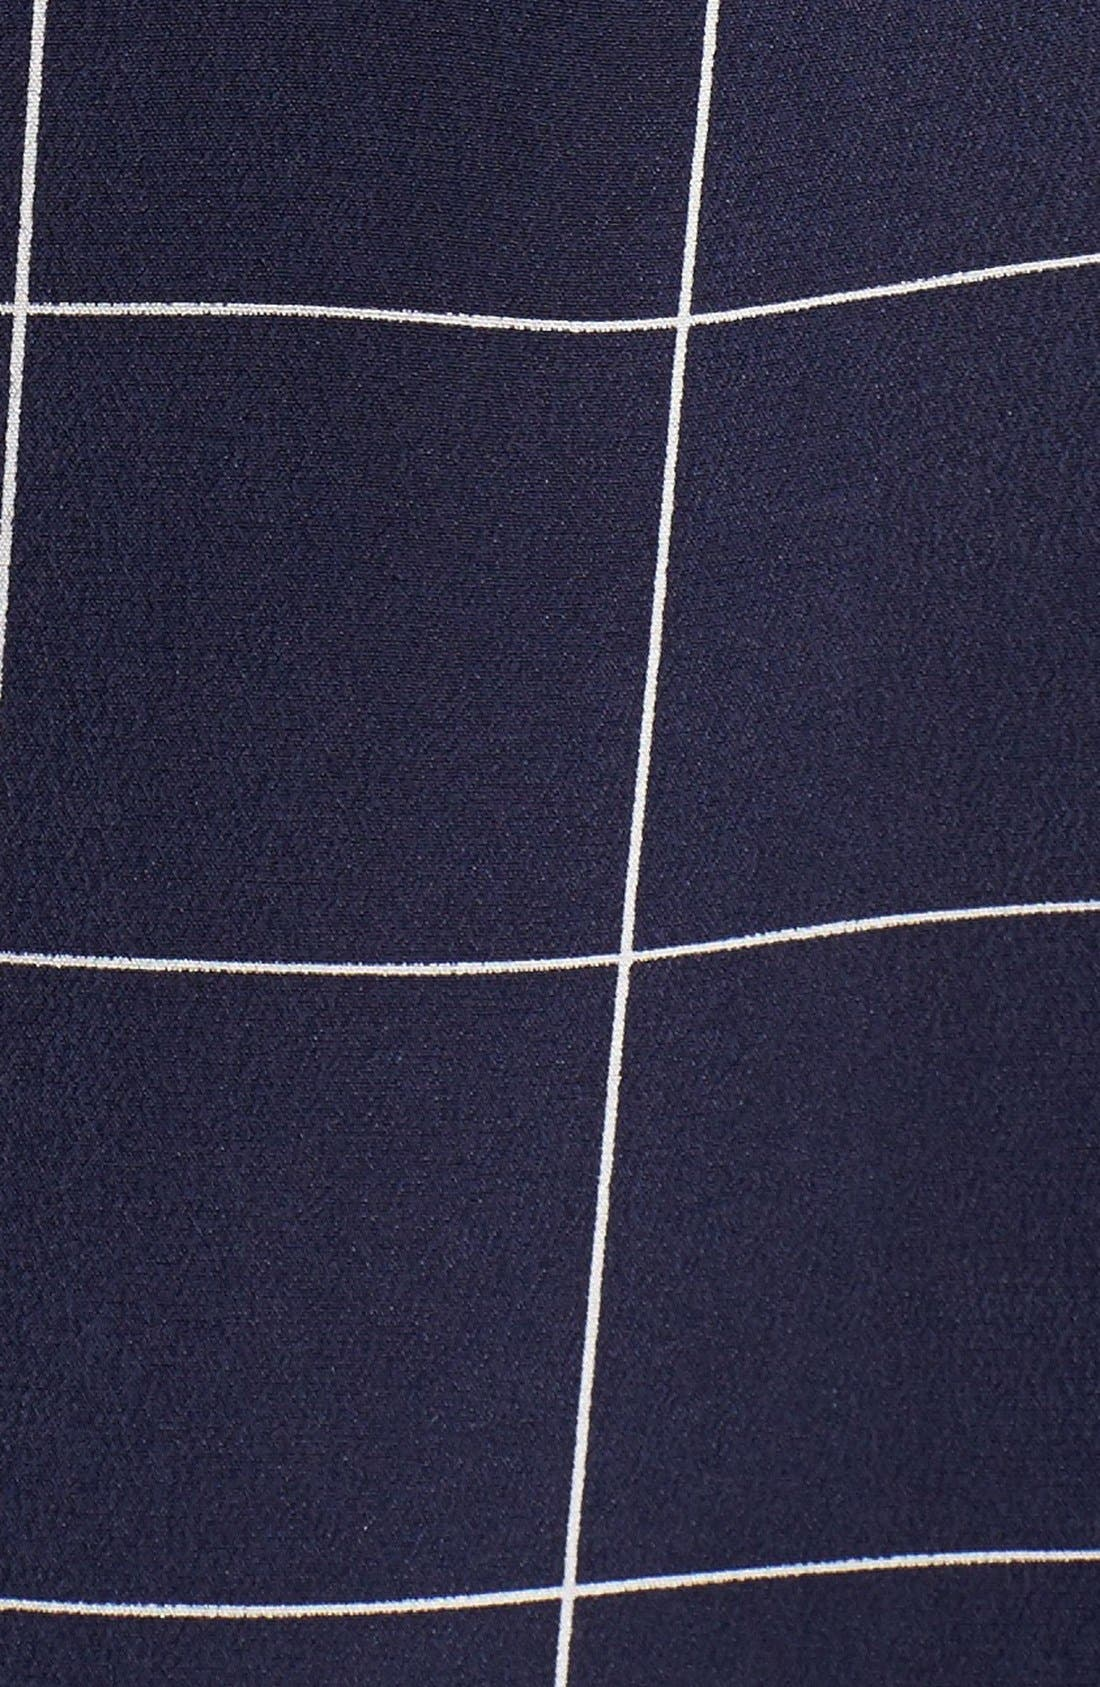 Alternate Image 5  - Madewell 'Monroe' Plaid Lace-Up Silk Blouse